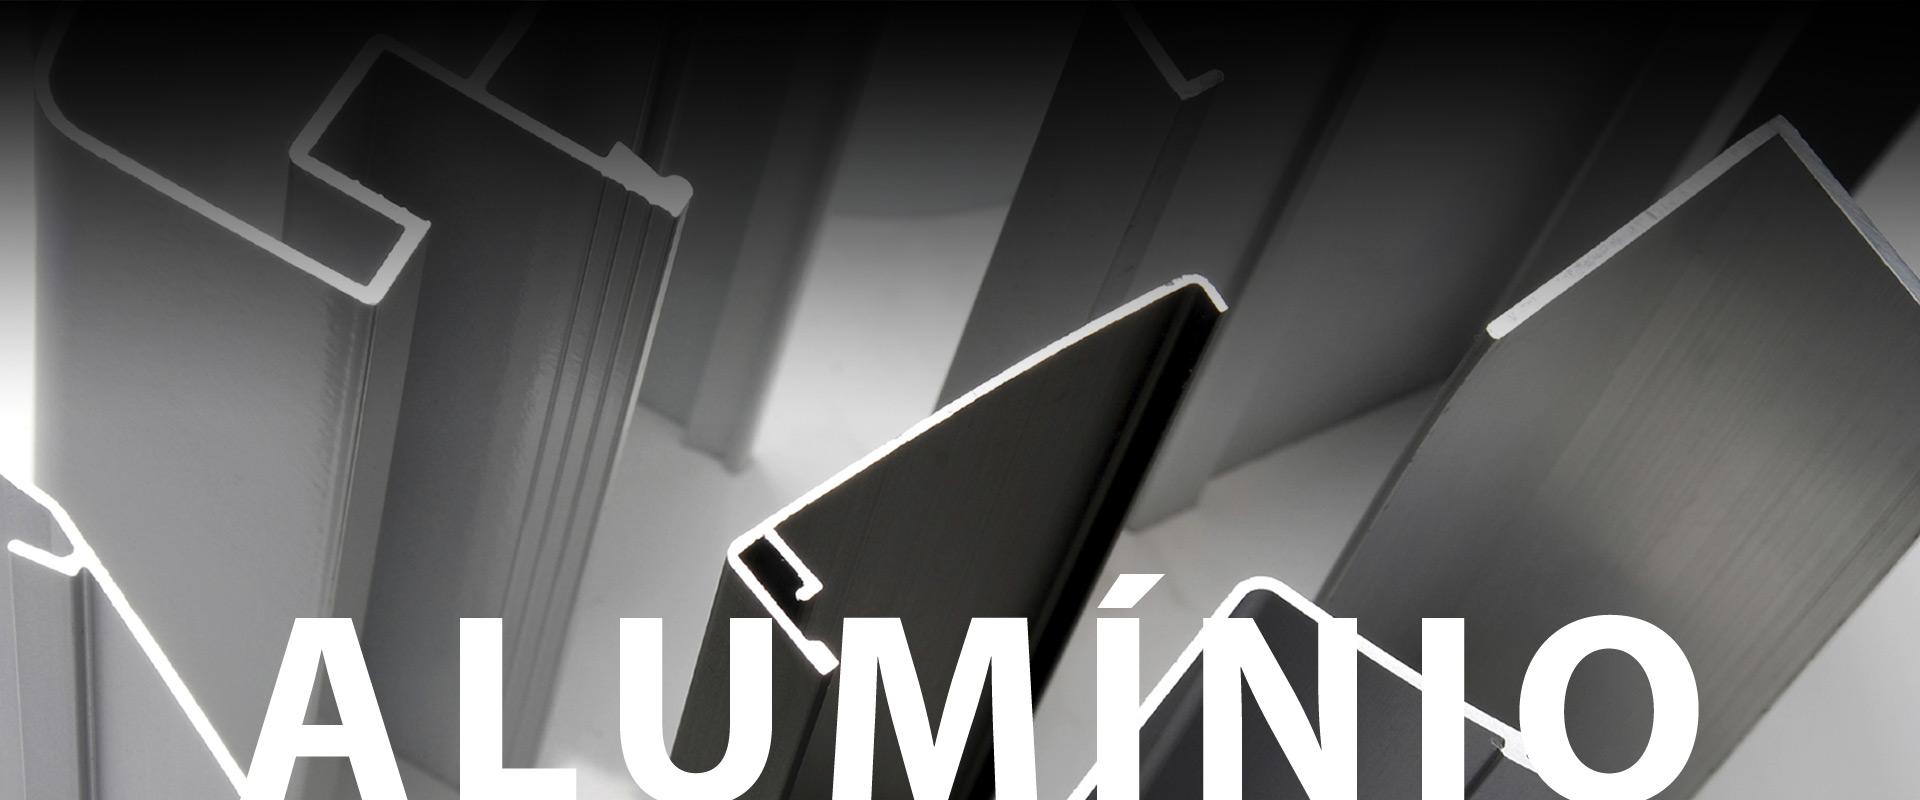 Simar-Fabricantes-Janelas-PVC-Aluminio